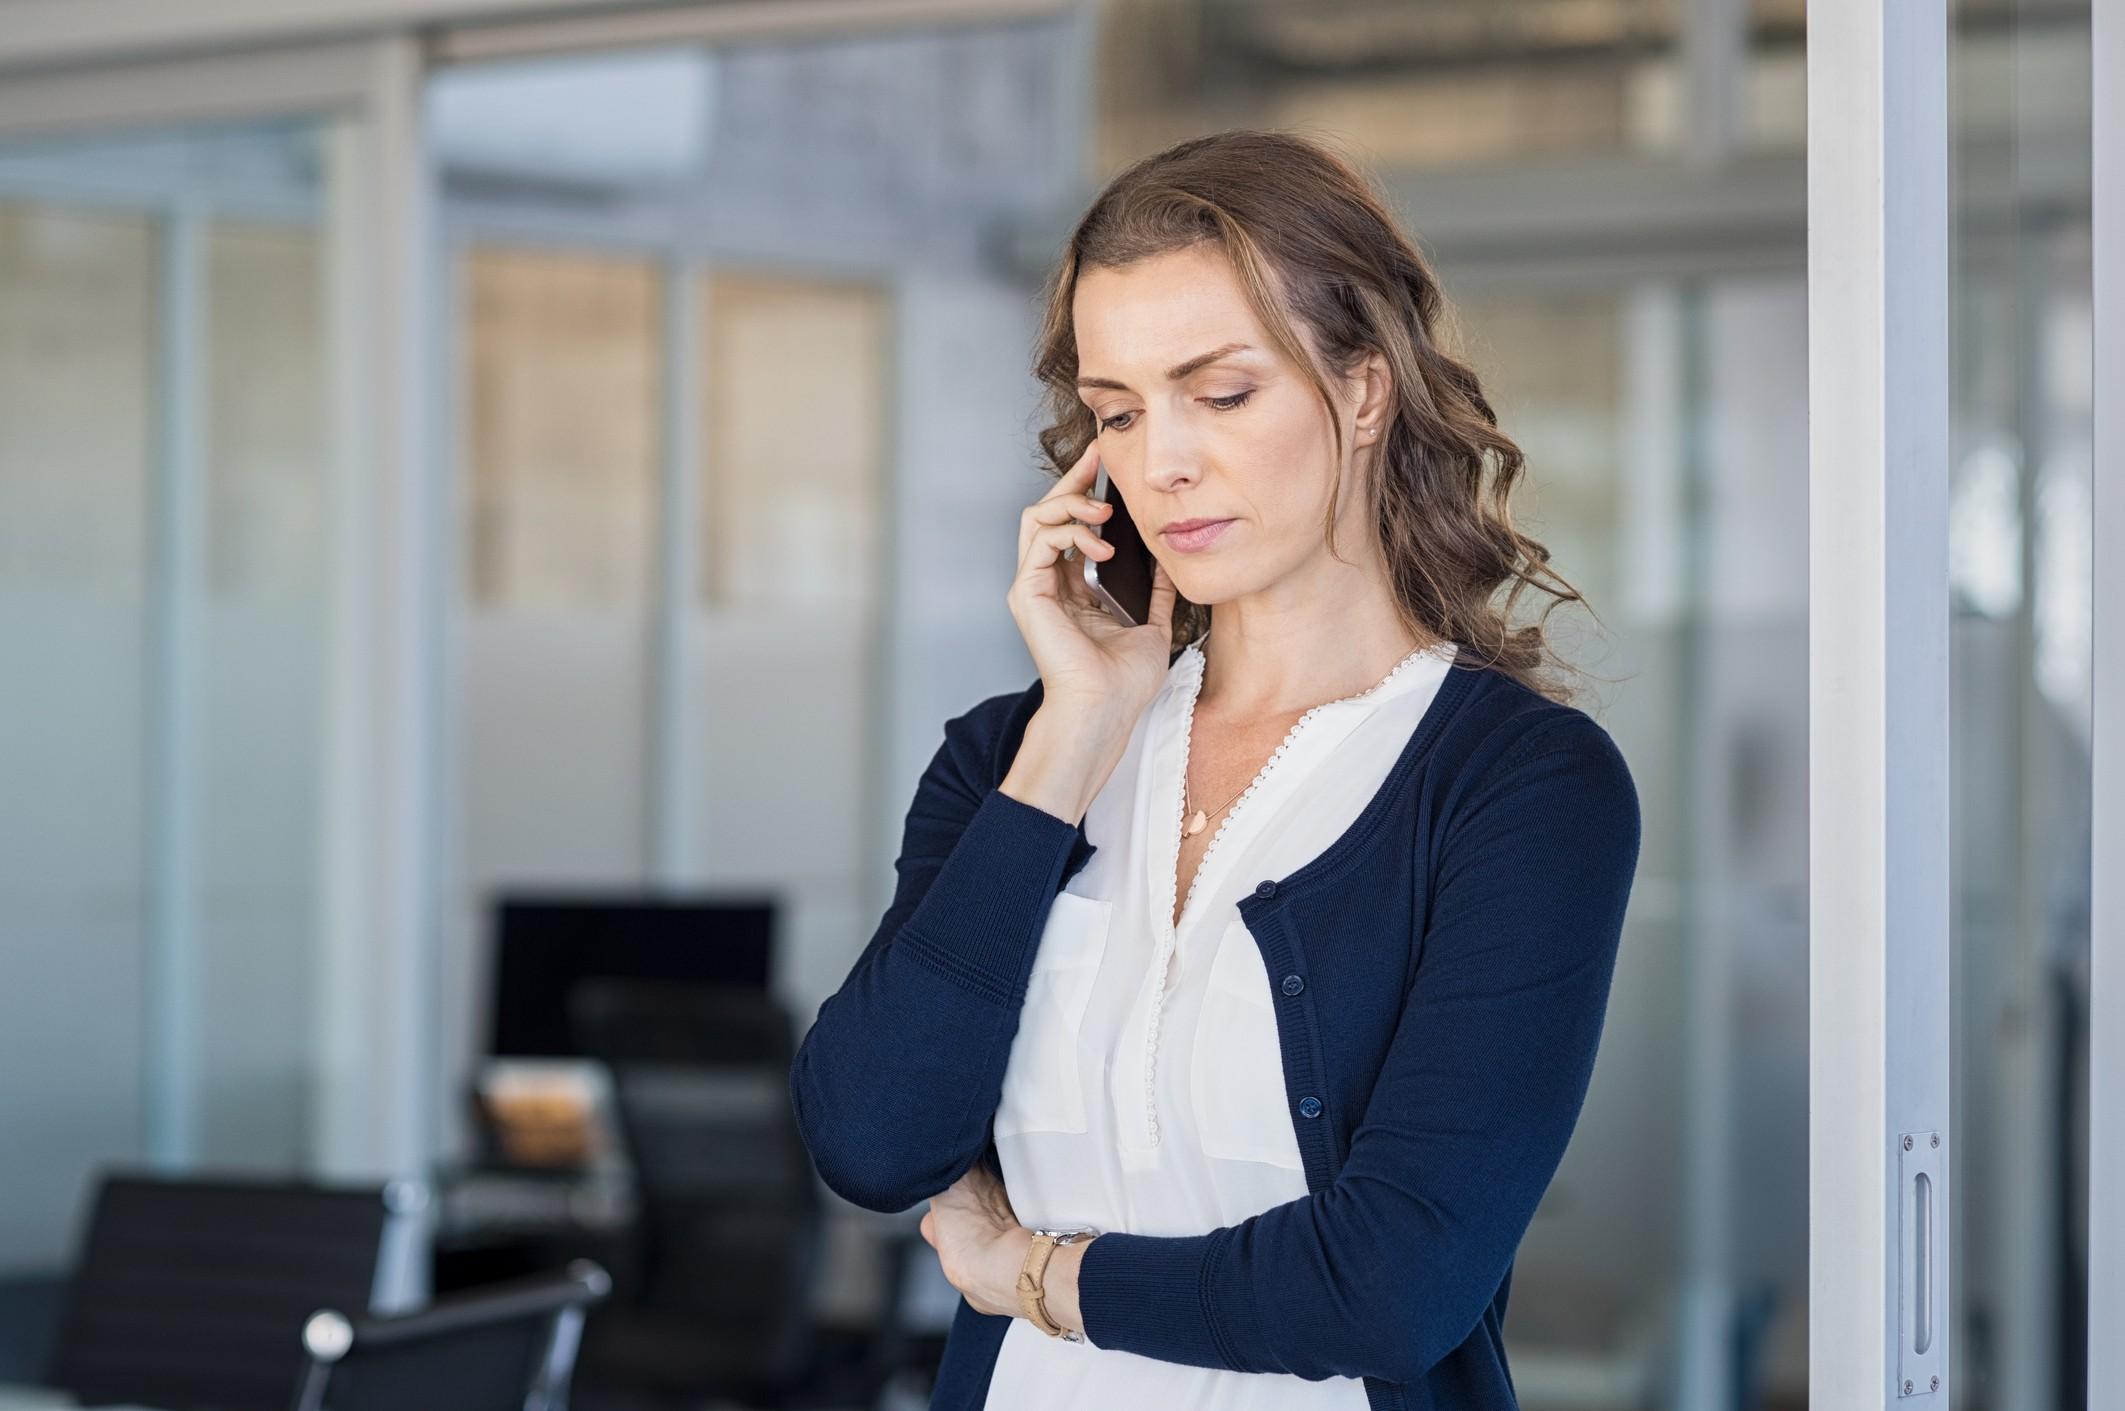 woman on phone